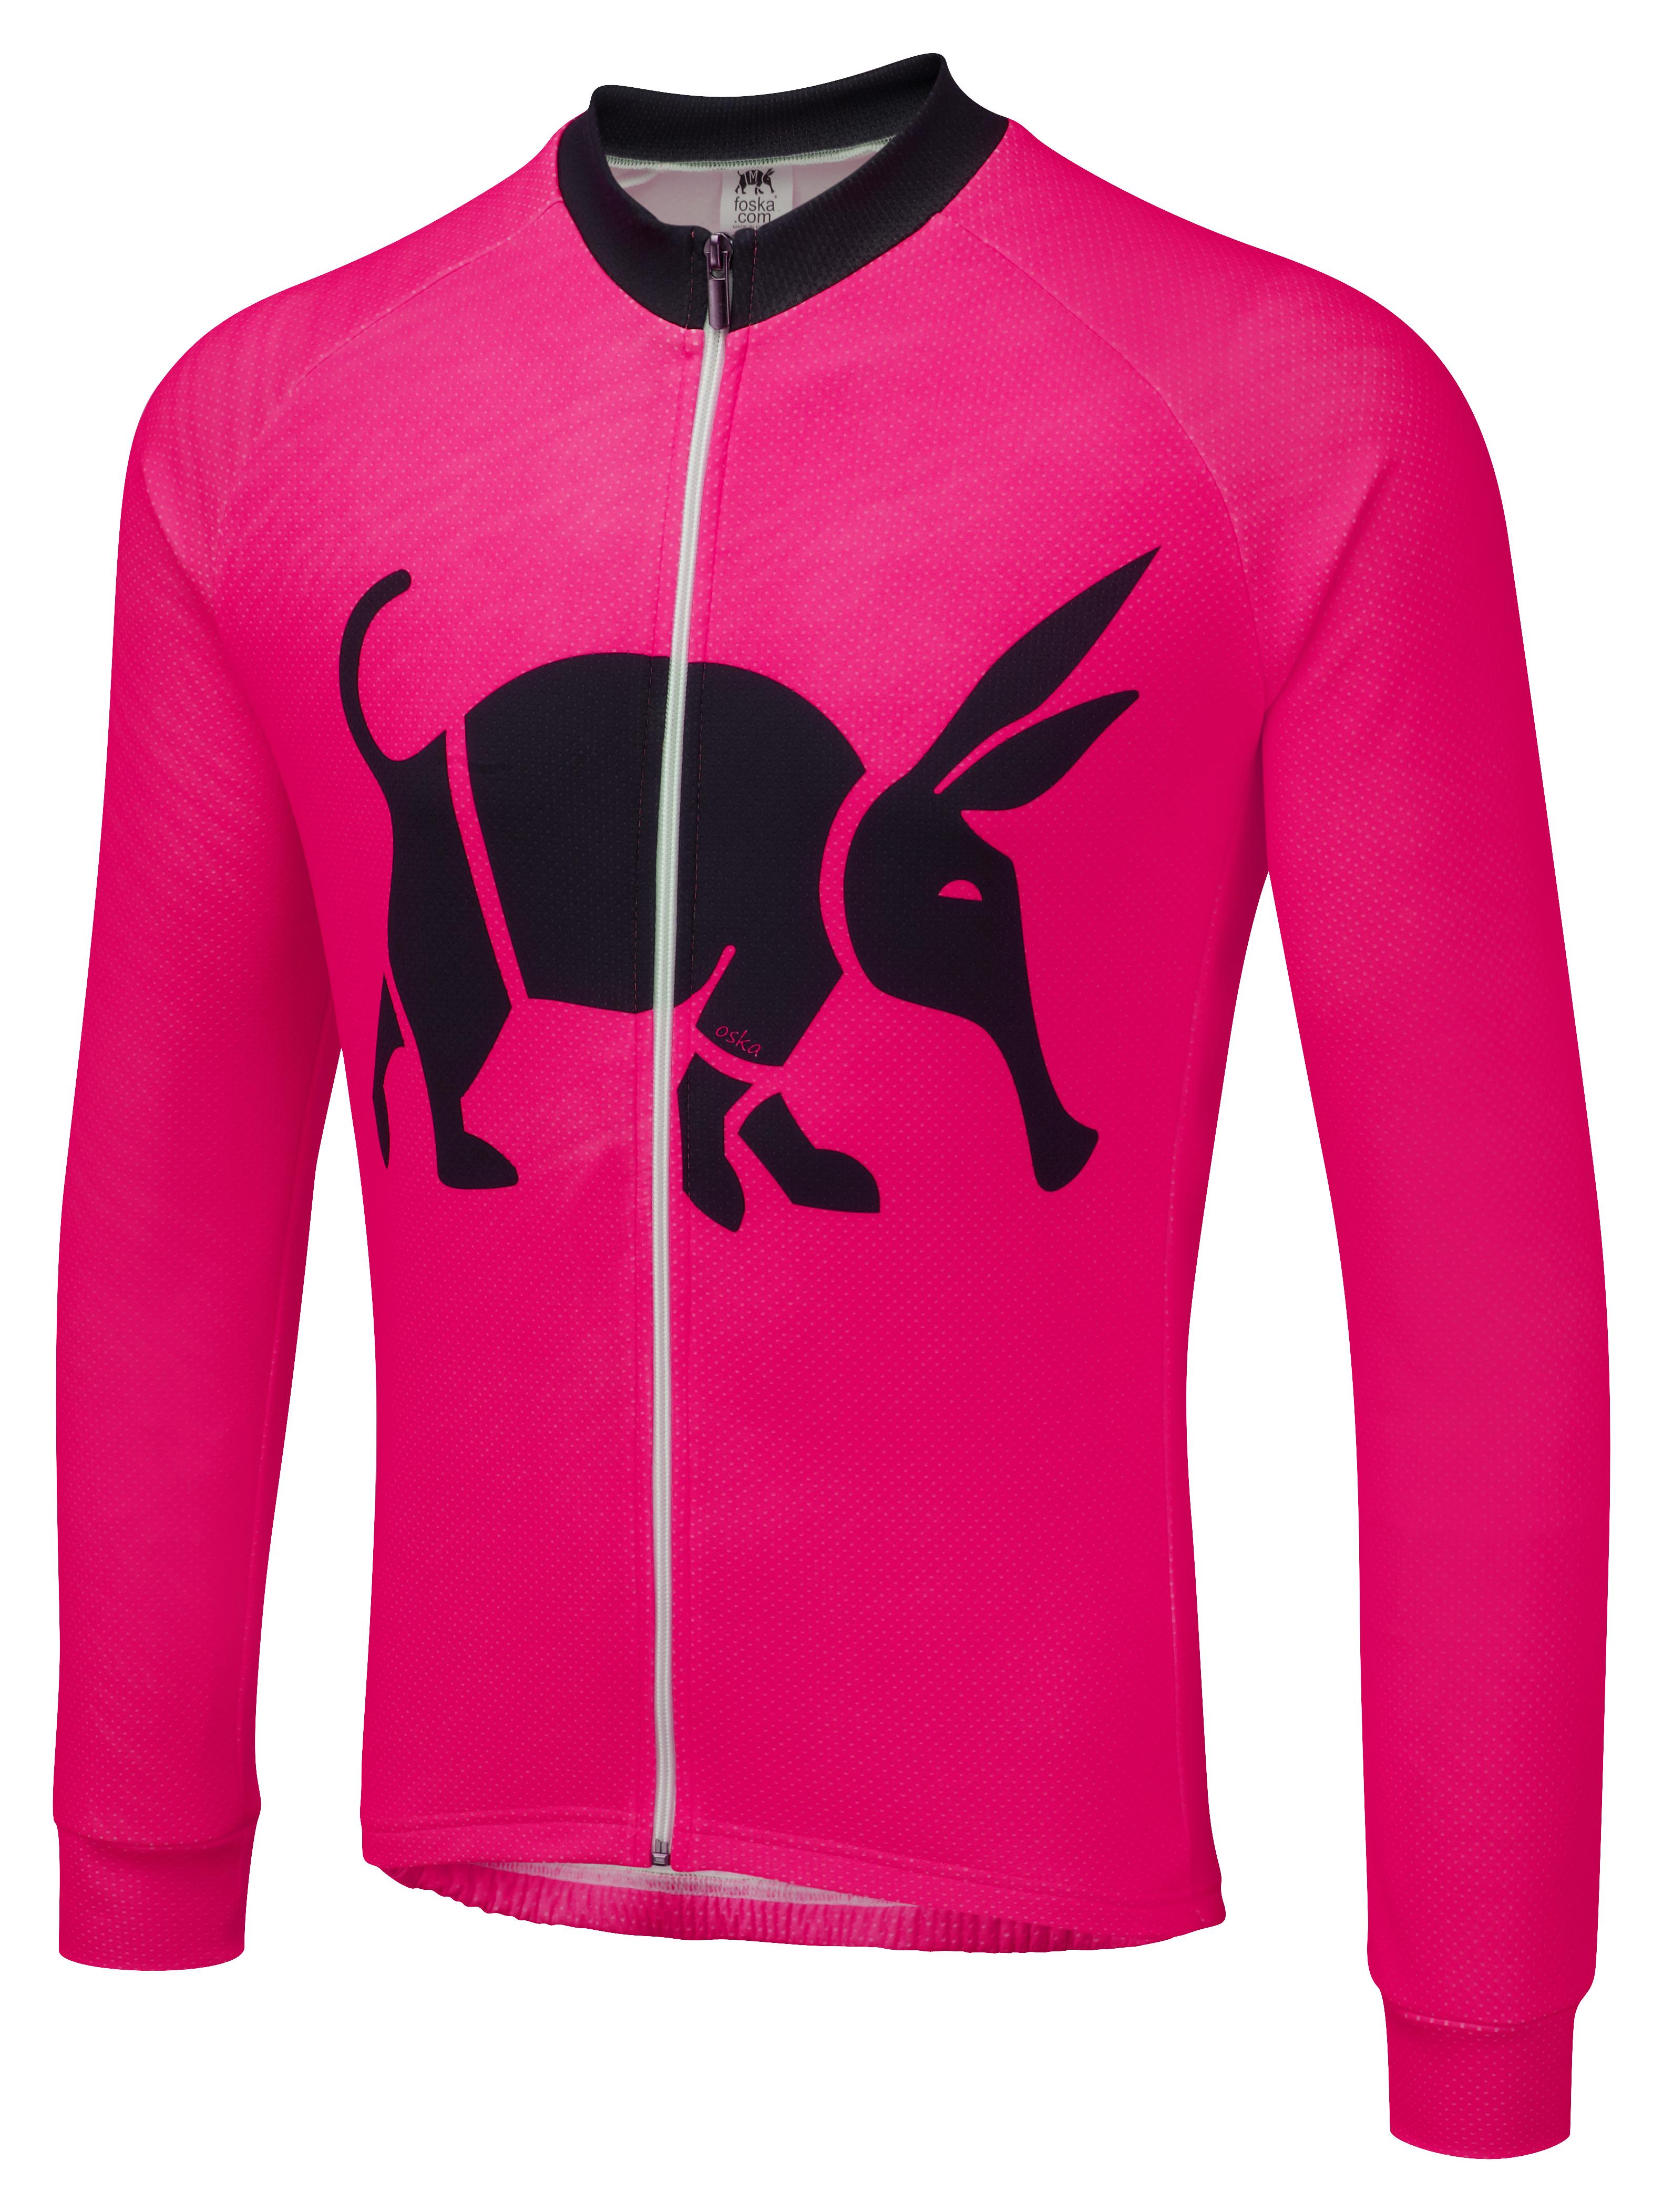 fb9f924ad Oska Fluro Pink Winter Cycling Jersey ...